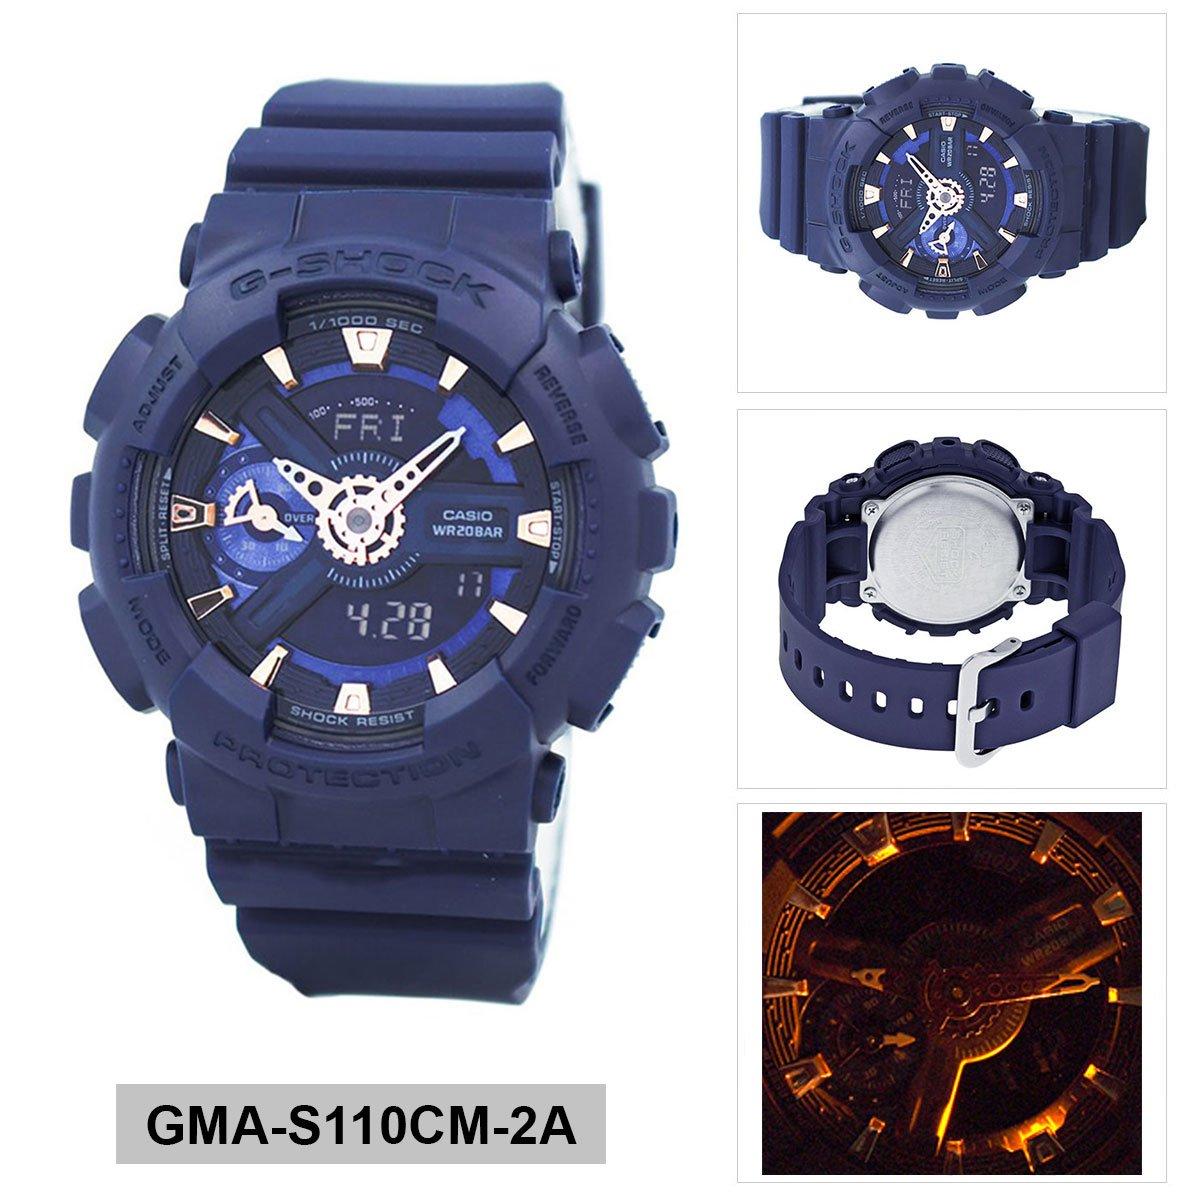 es AsiaGma Relojmodelo De 2aAmazon Casio G Shock S110cm dxBCoe